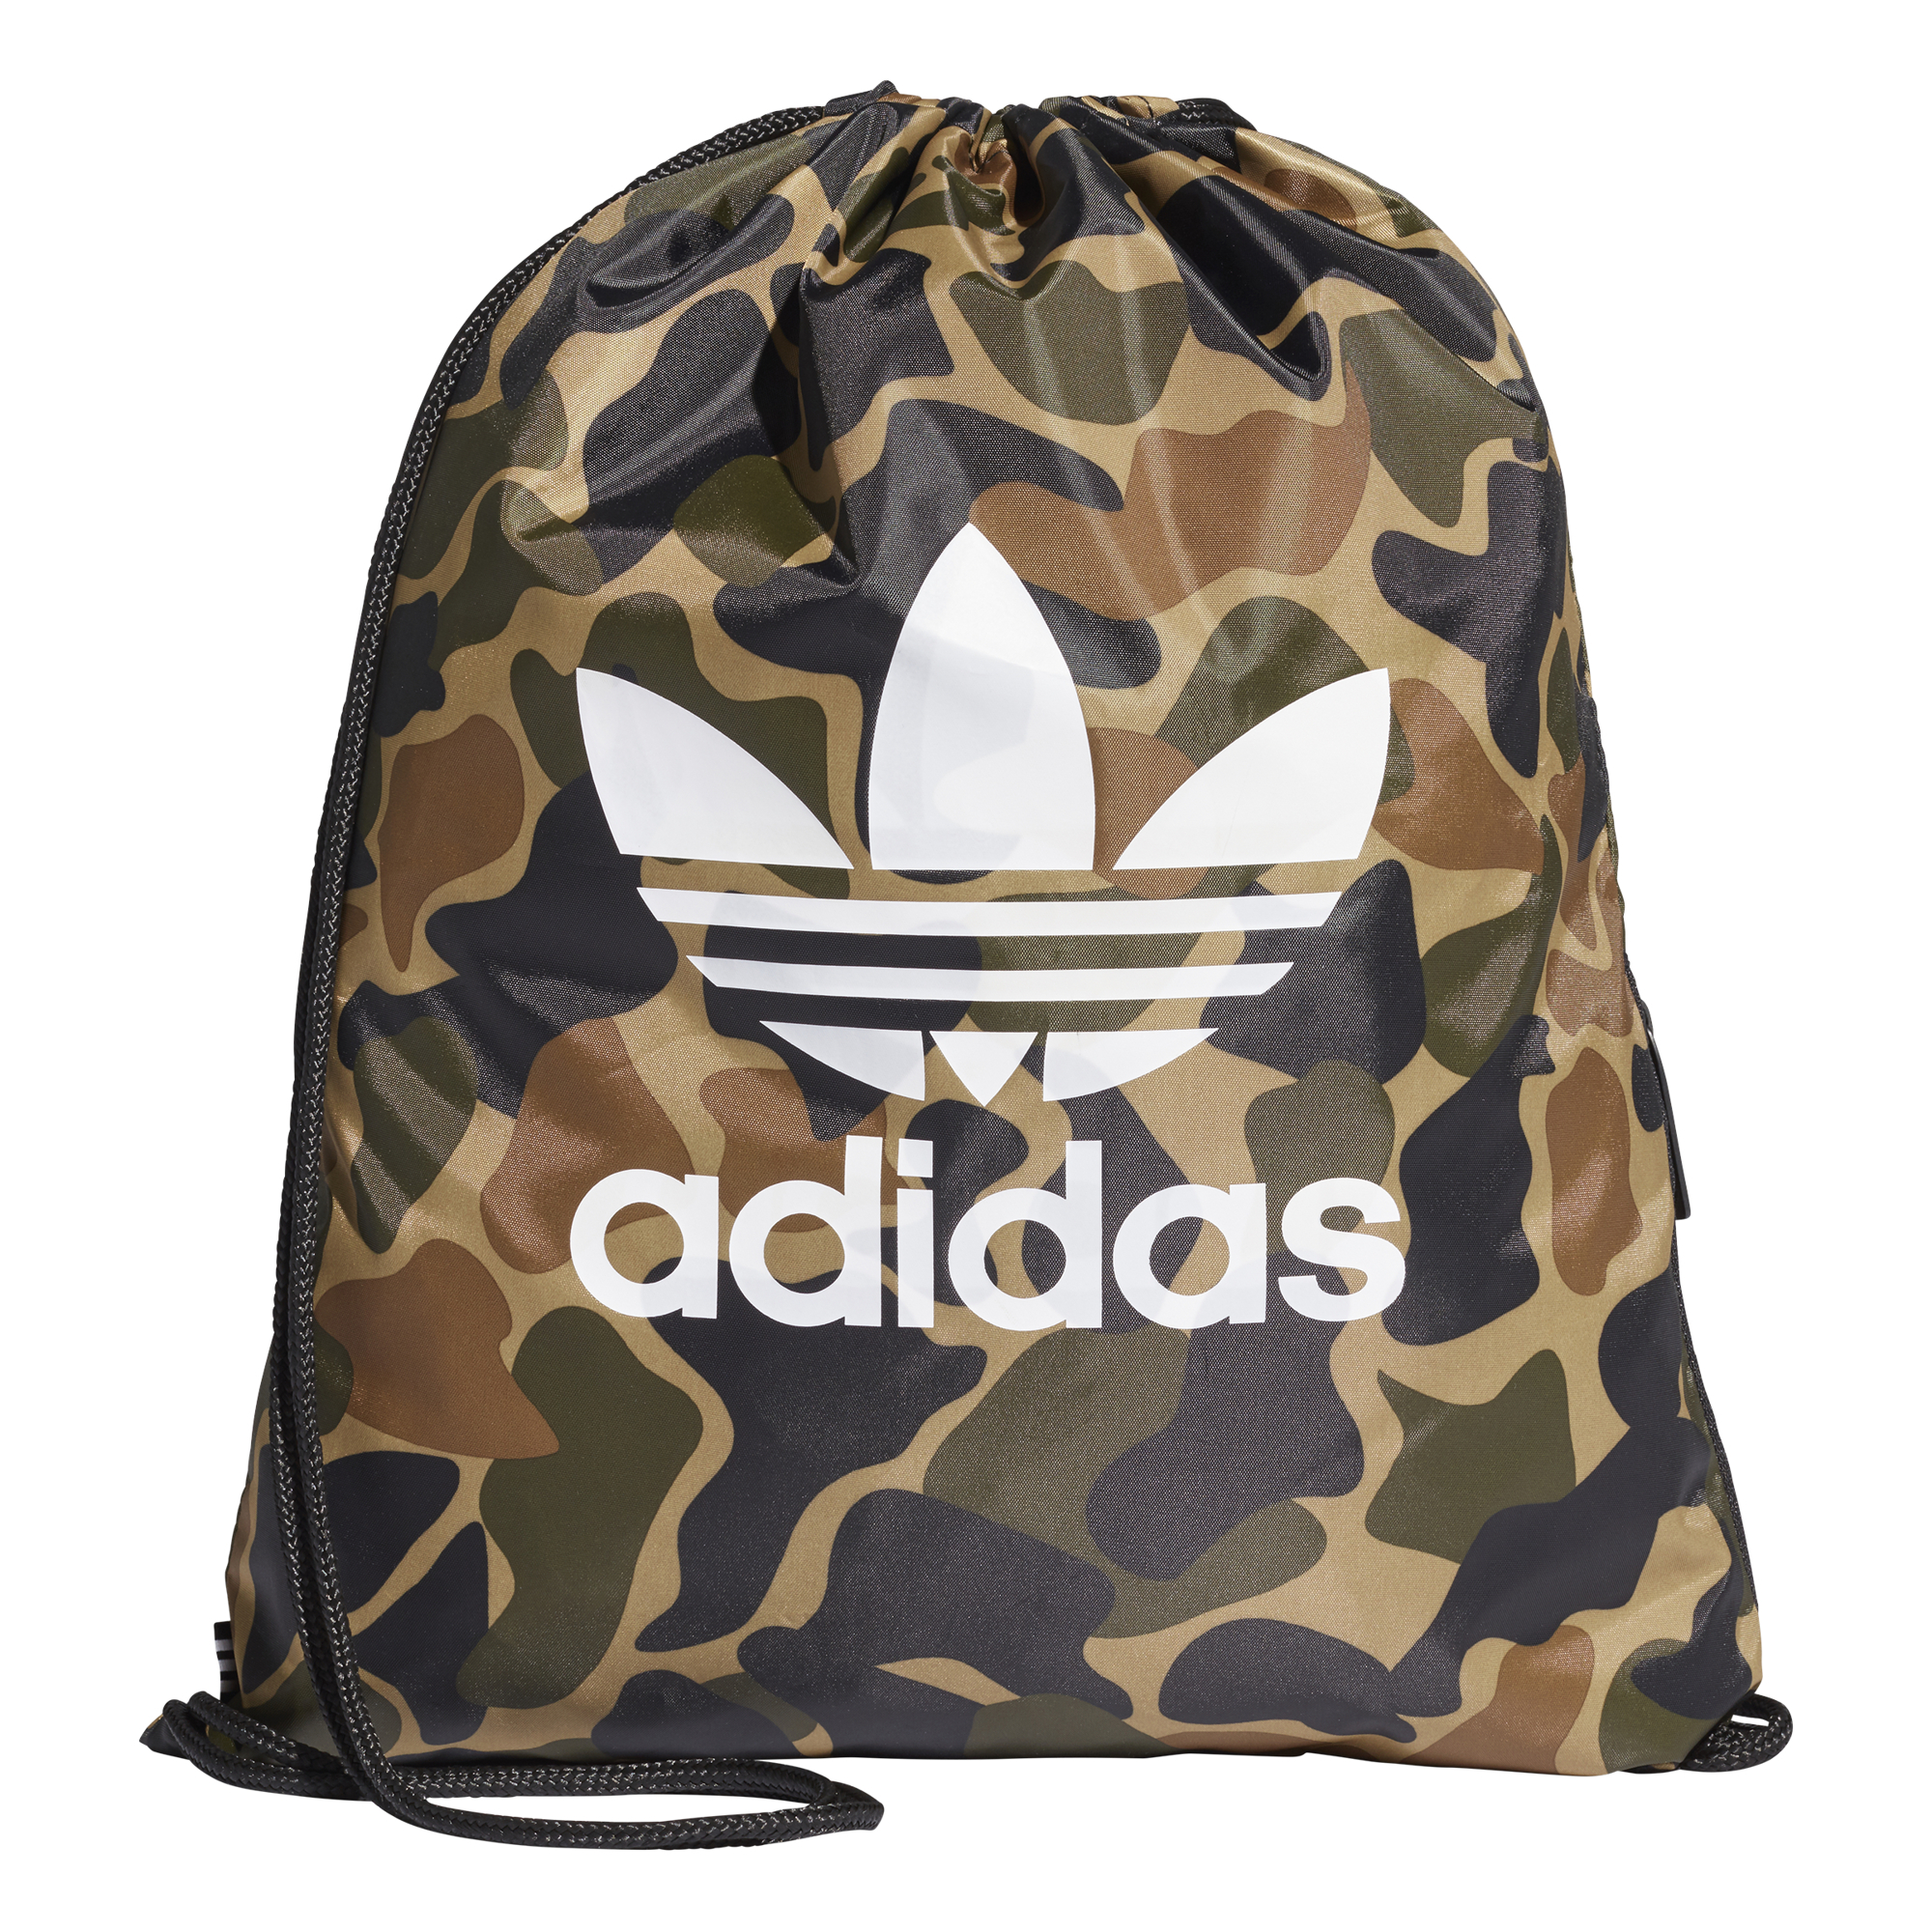 eb4431483d8f Adidas Gym Sack Camouflage - Boardvillage